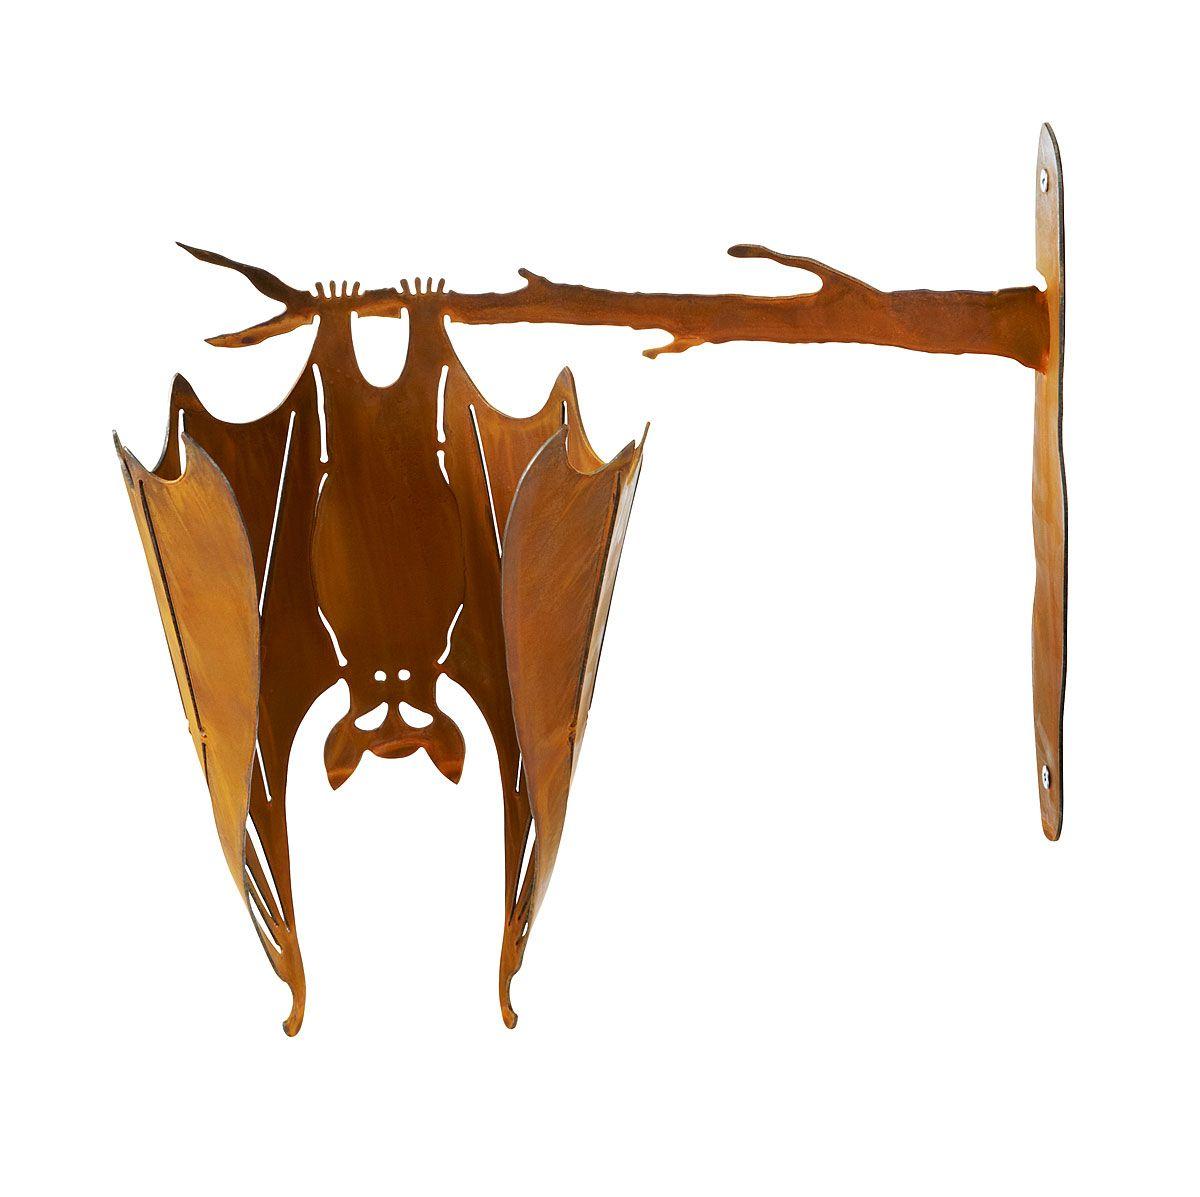 Bat On A Branch Outdoor Halloween Decor Porch Decoration